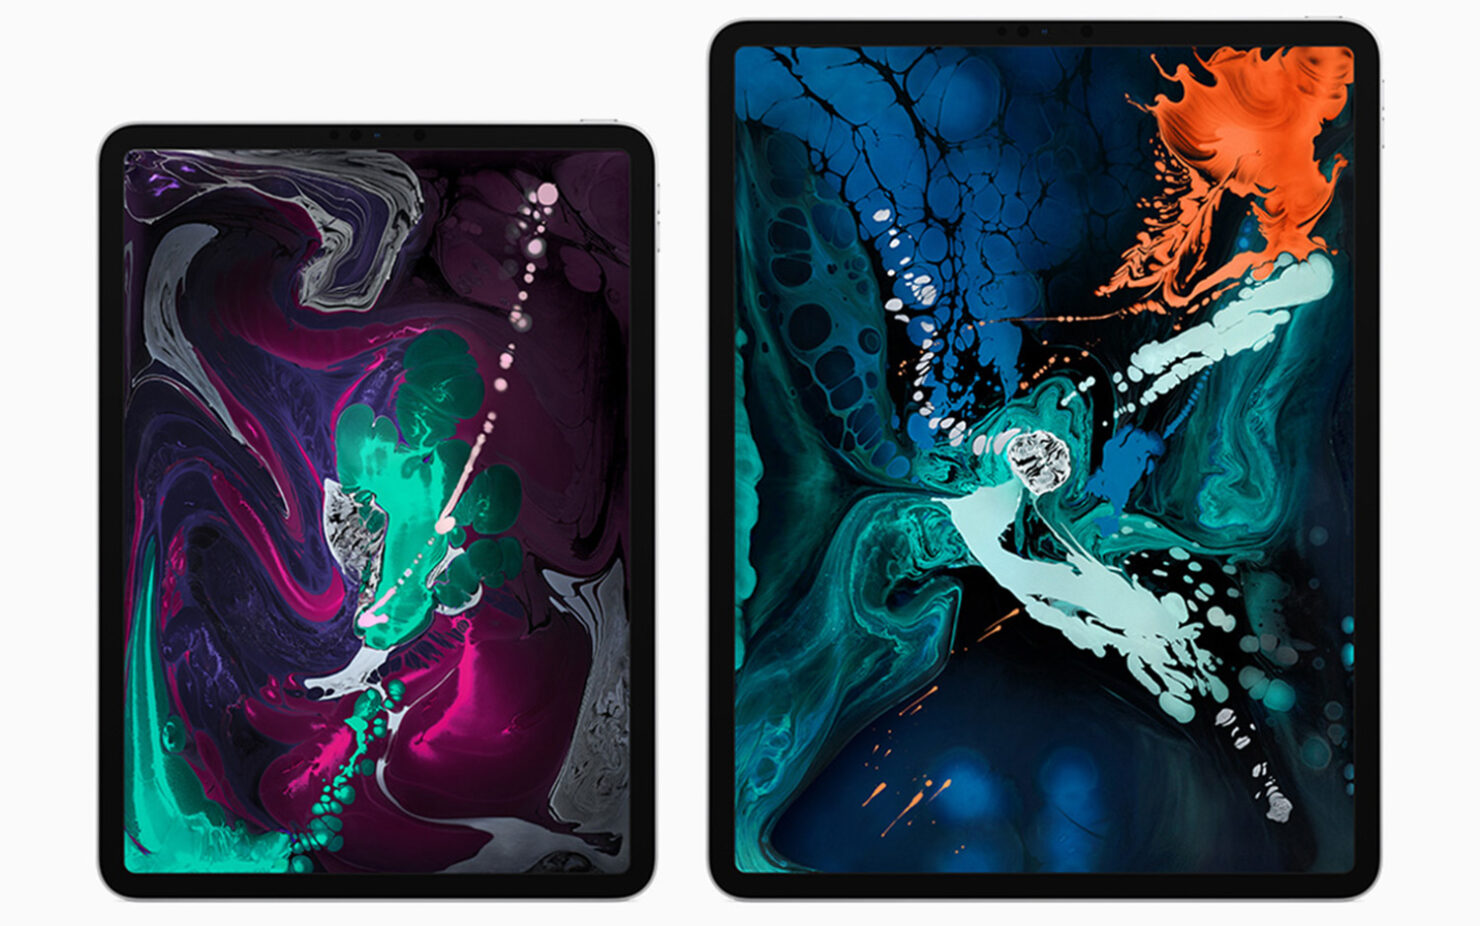 Apple observes an iPad Pro price cut of $200